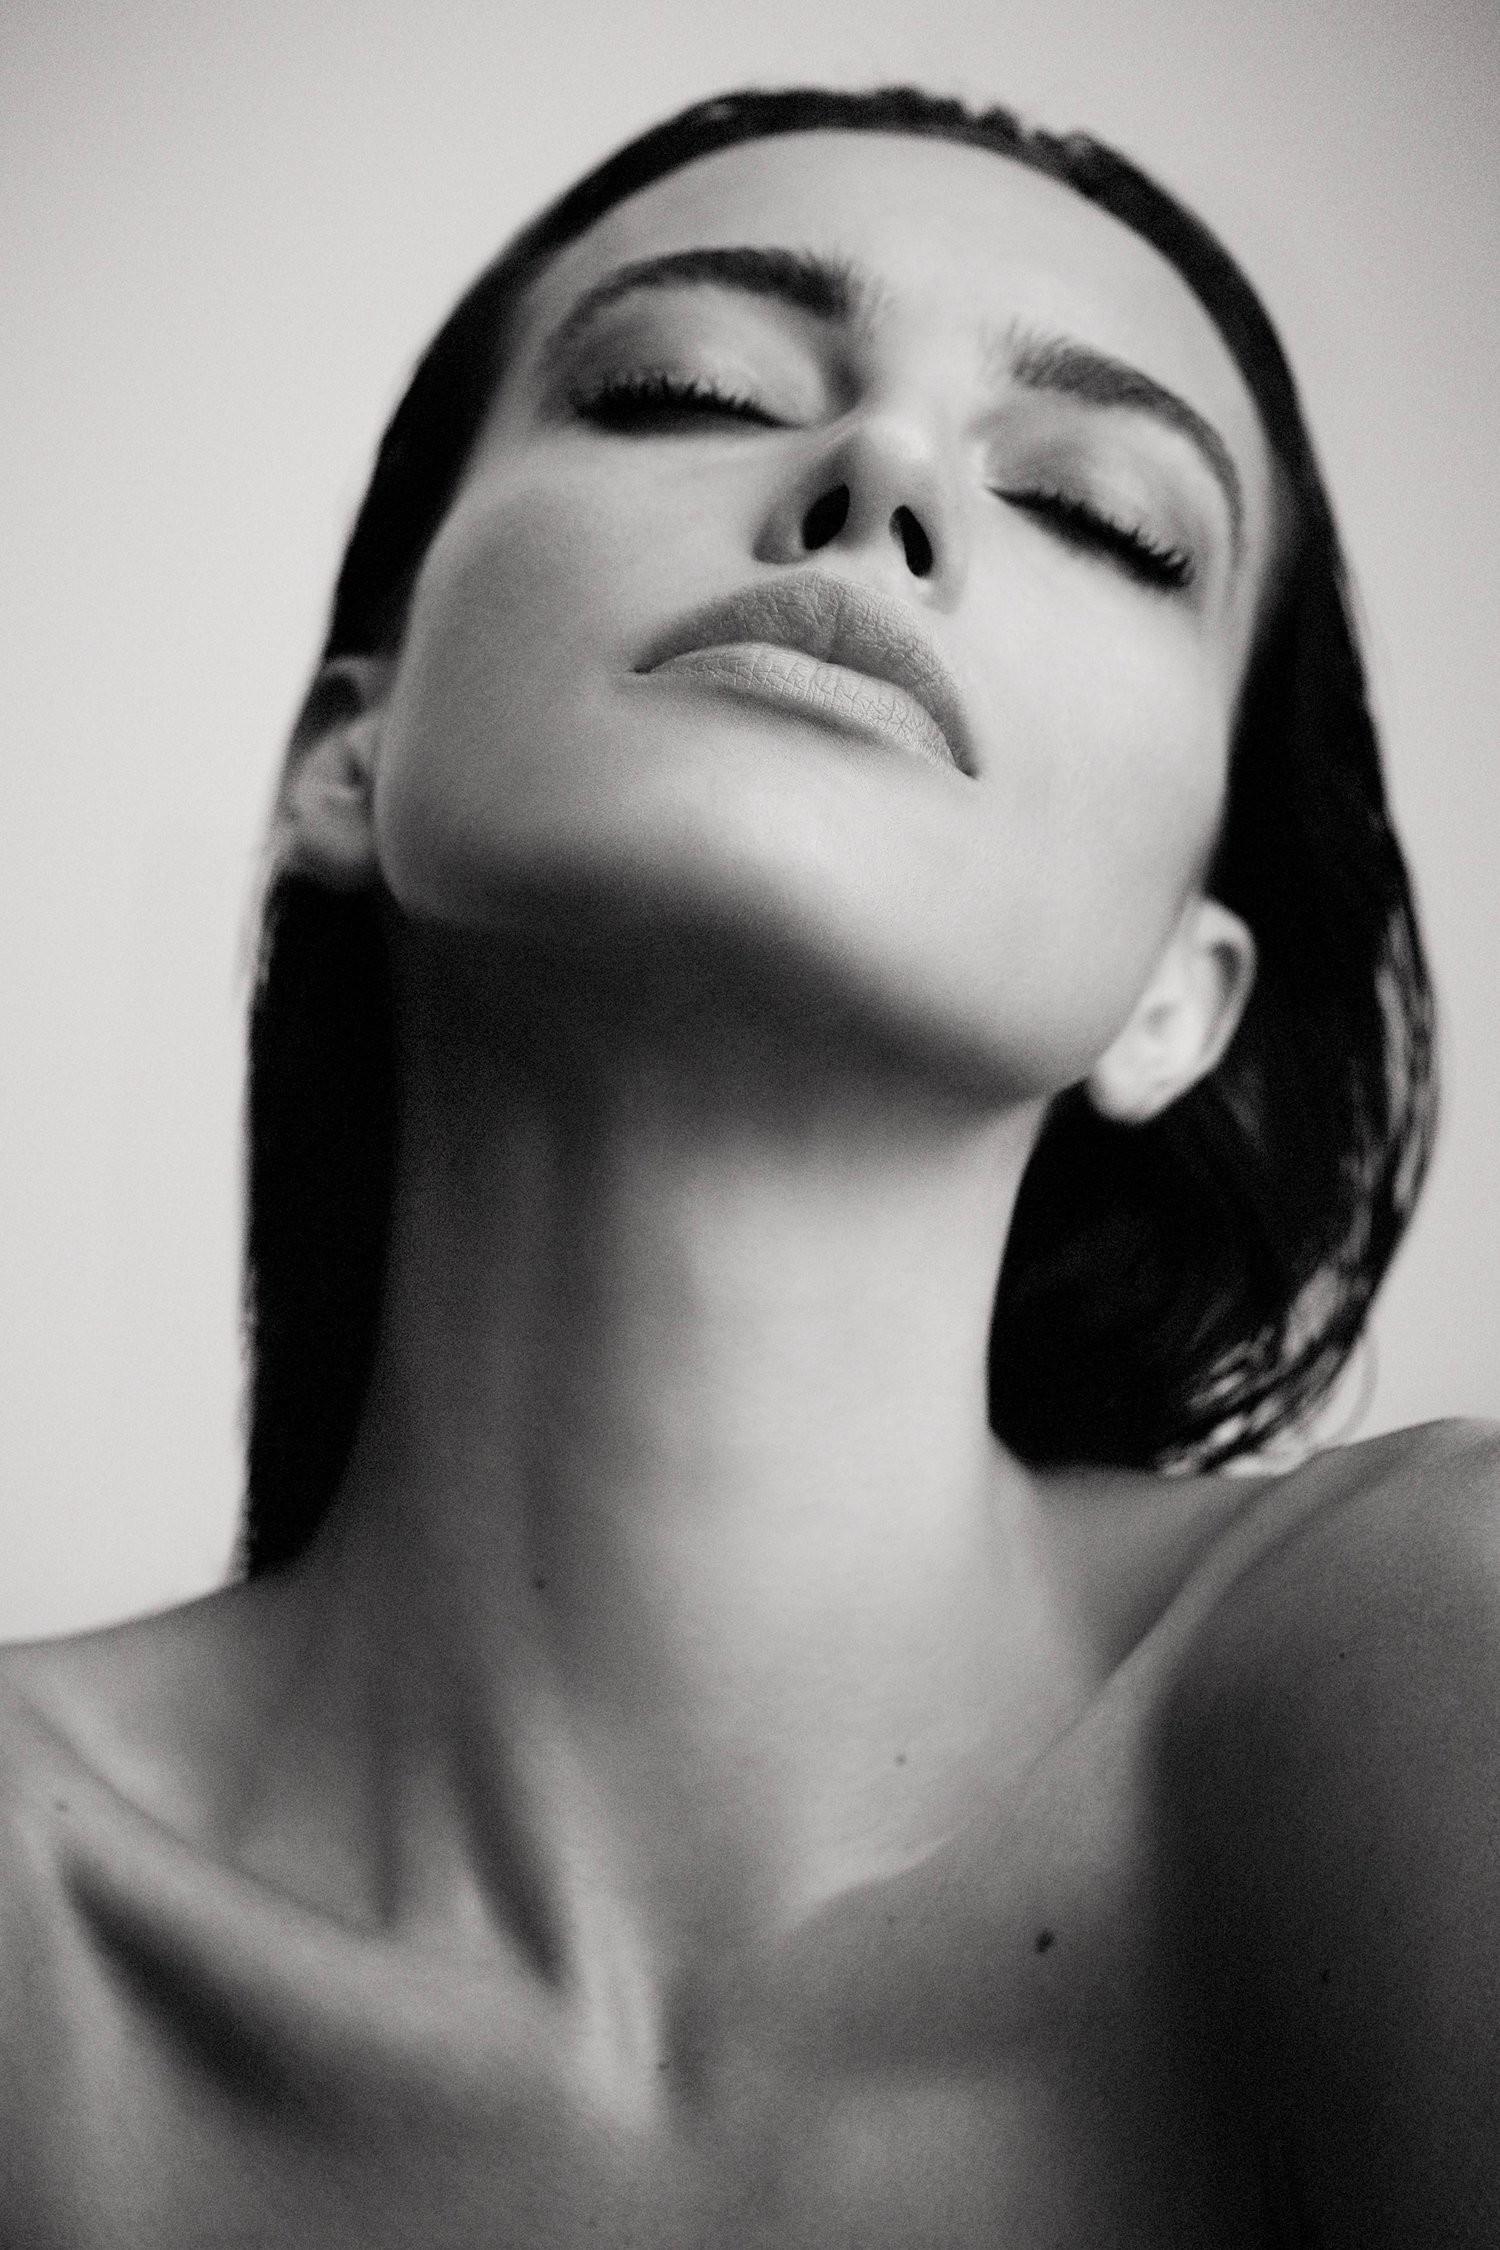 Leaked Meri Gulin nudes (94 photo), Ass, Hot, Selfie, in bikini 2006